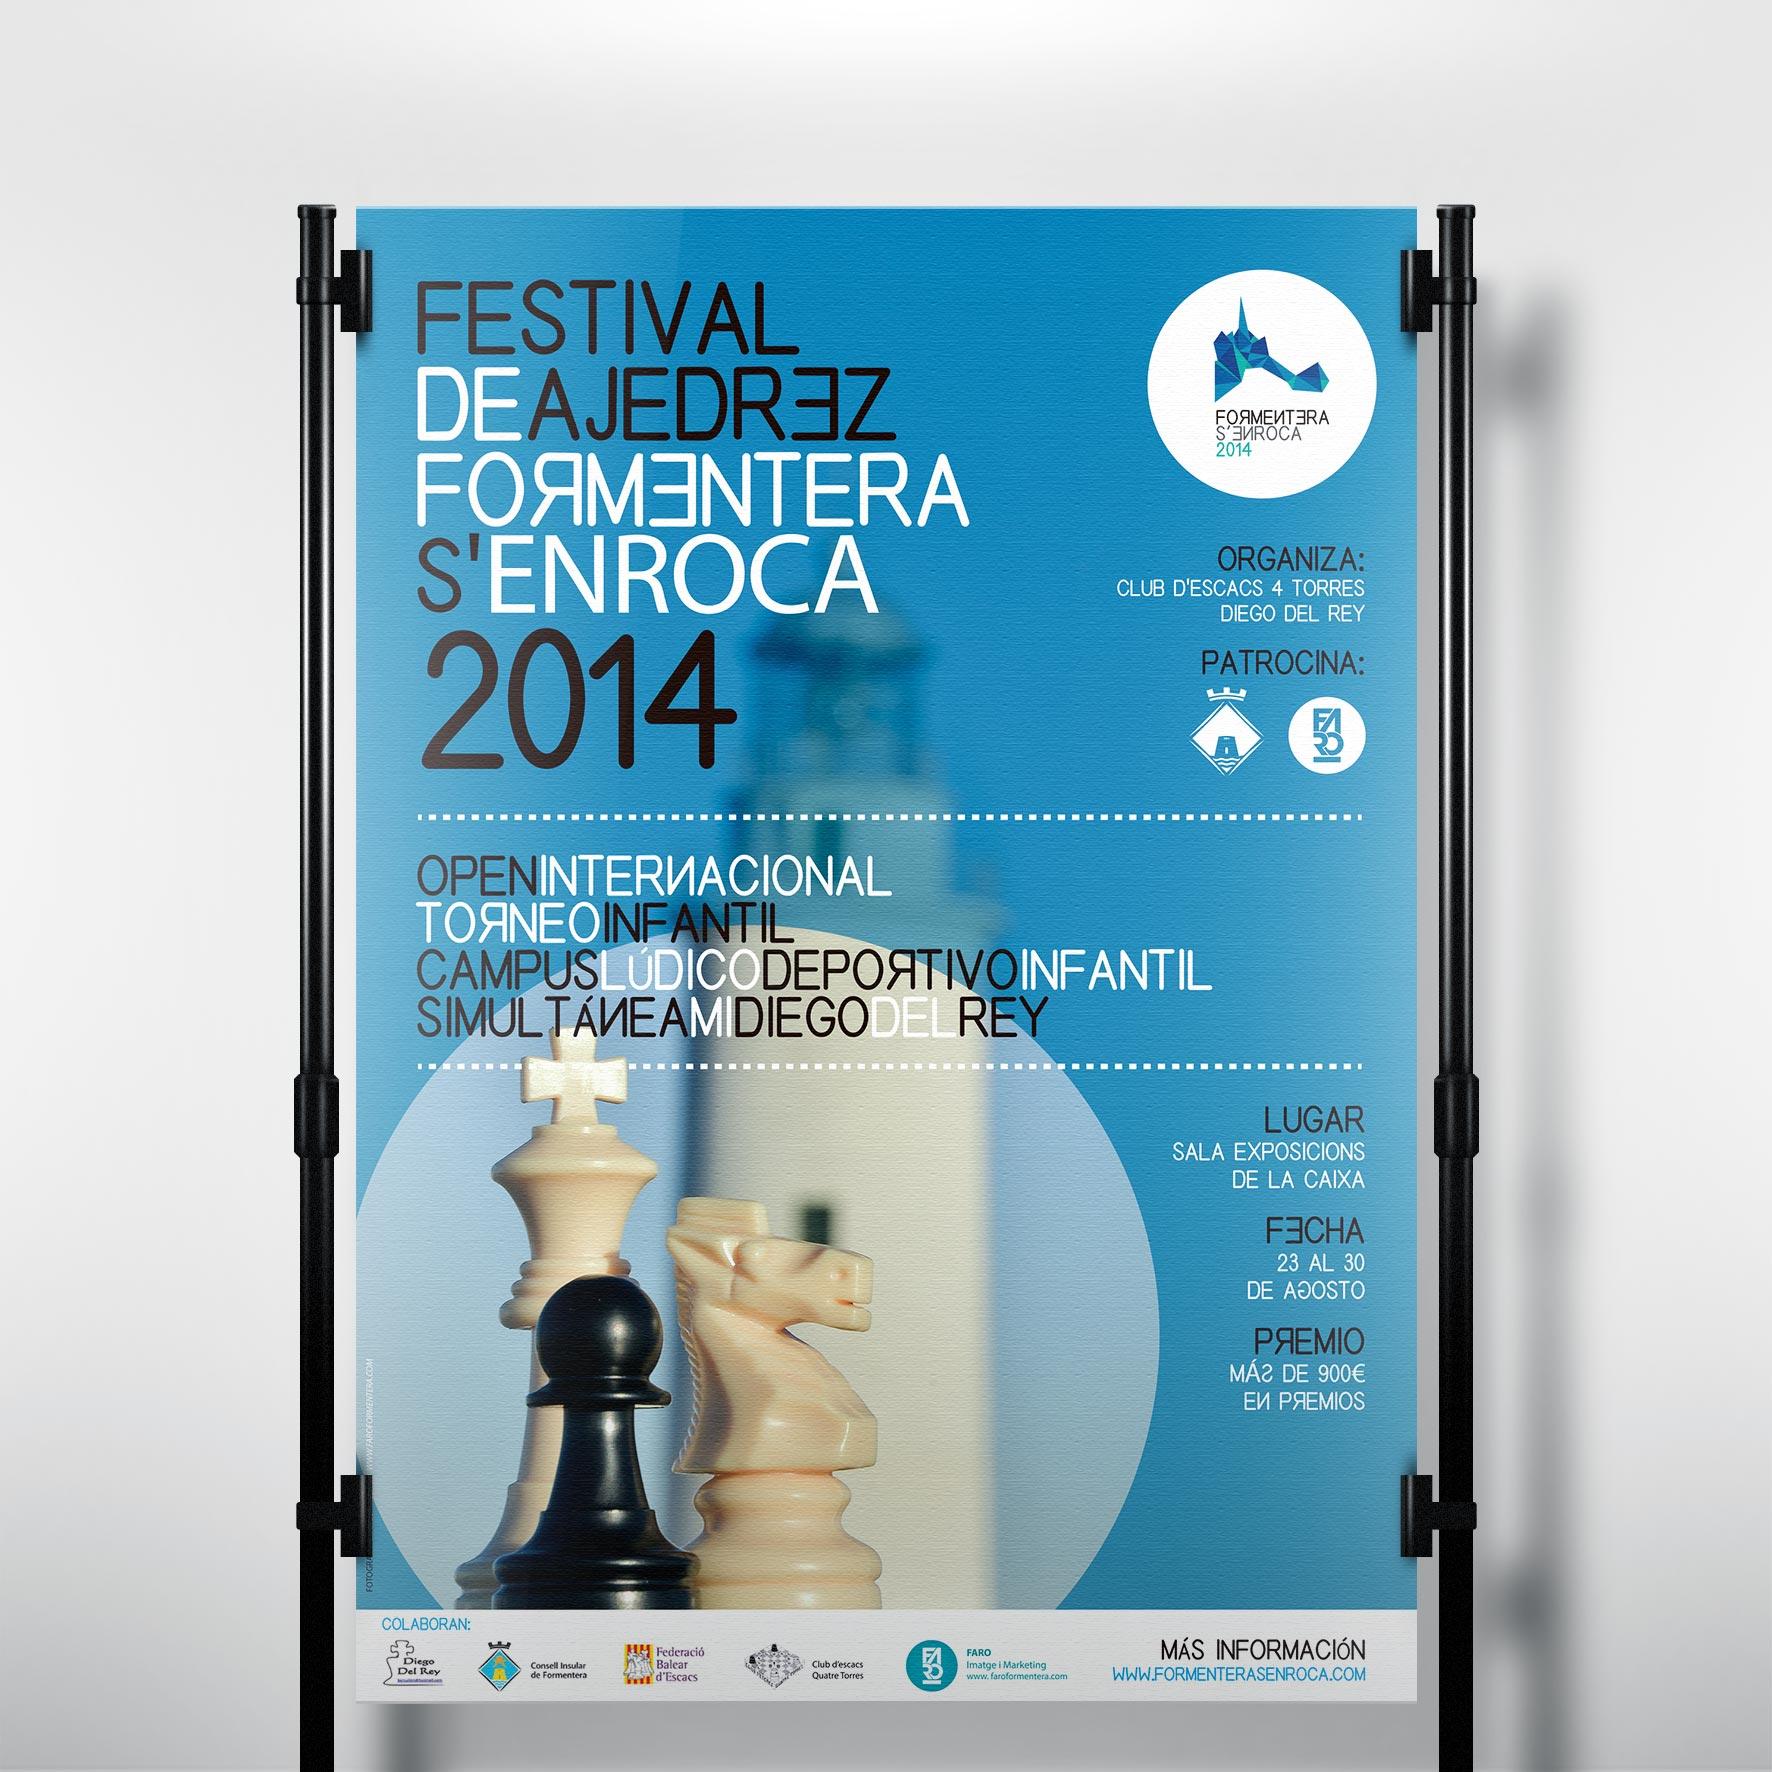 FORMENTERA S'ENROCA 2014